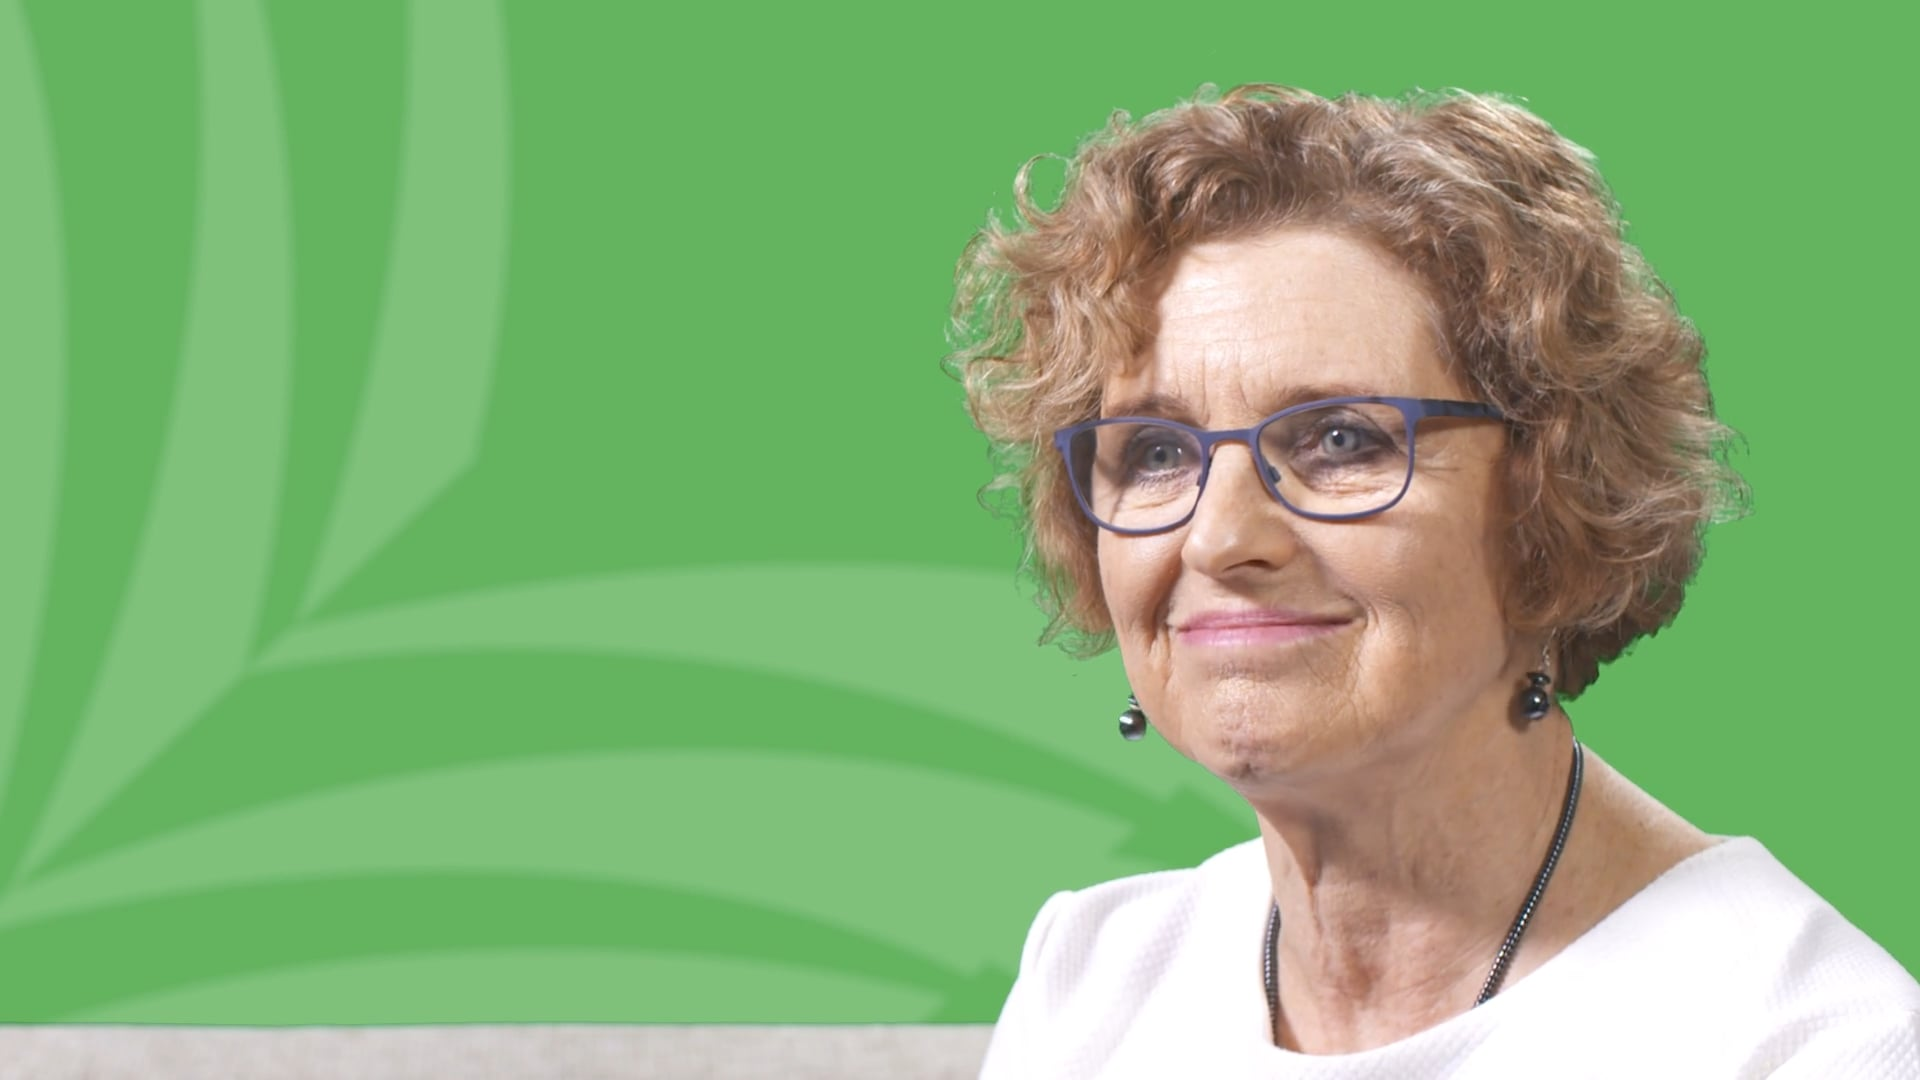 Carol Anderson - Handling Complaints